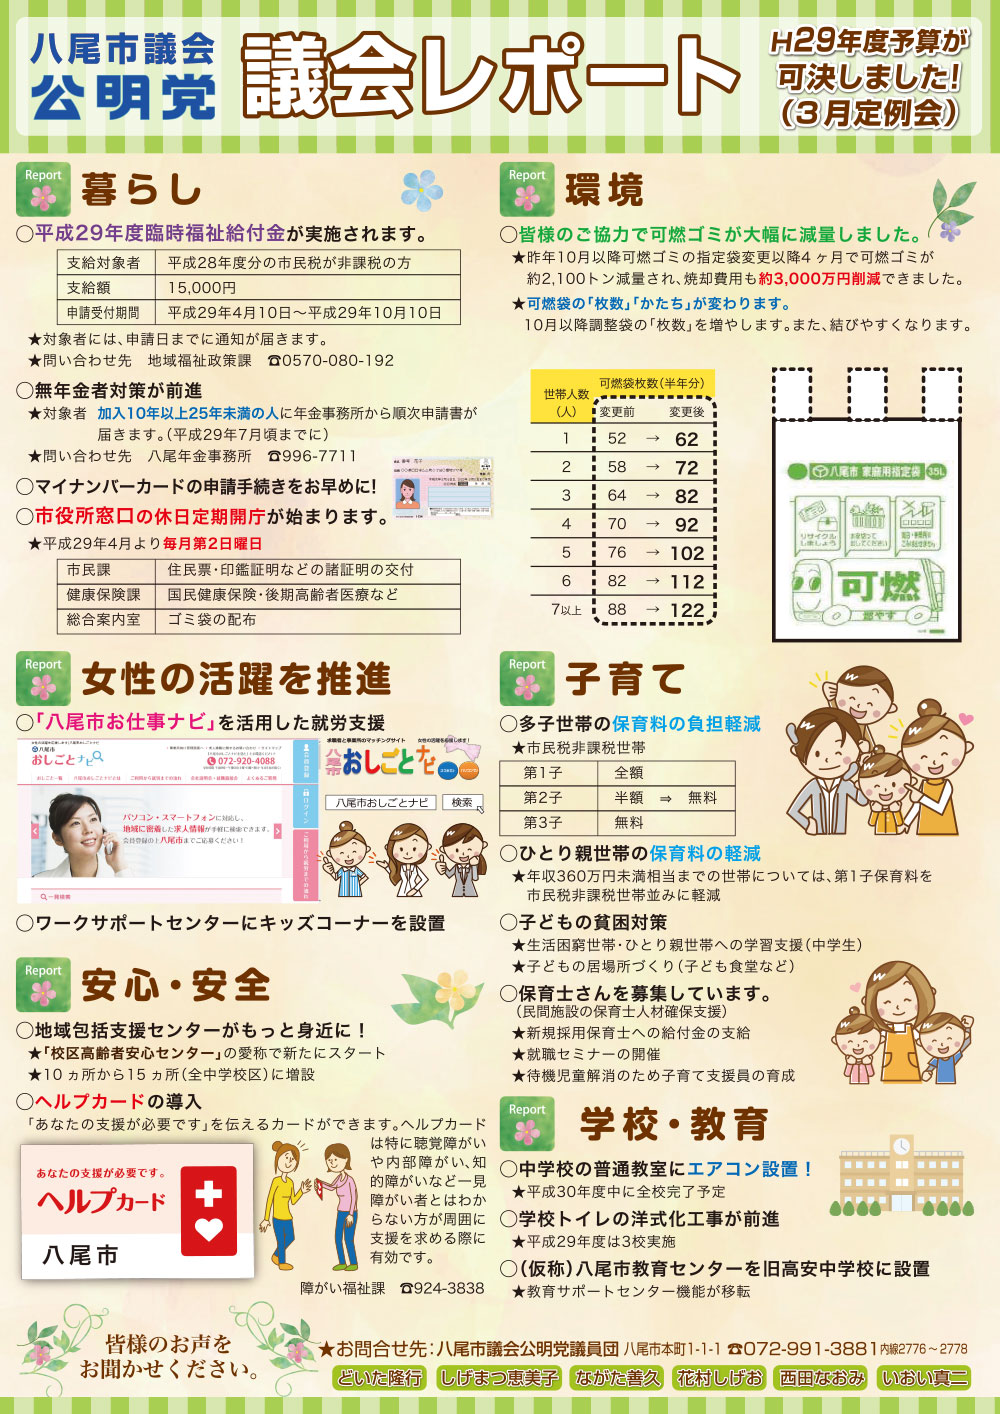 八尾市議会公明党議会レポート(2017年)